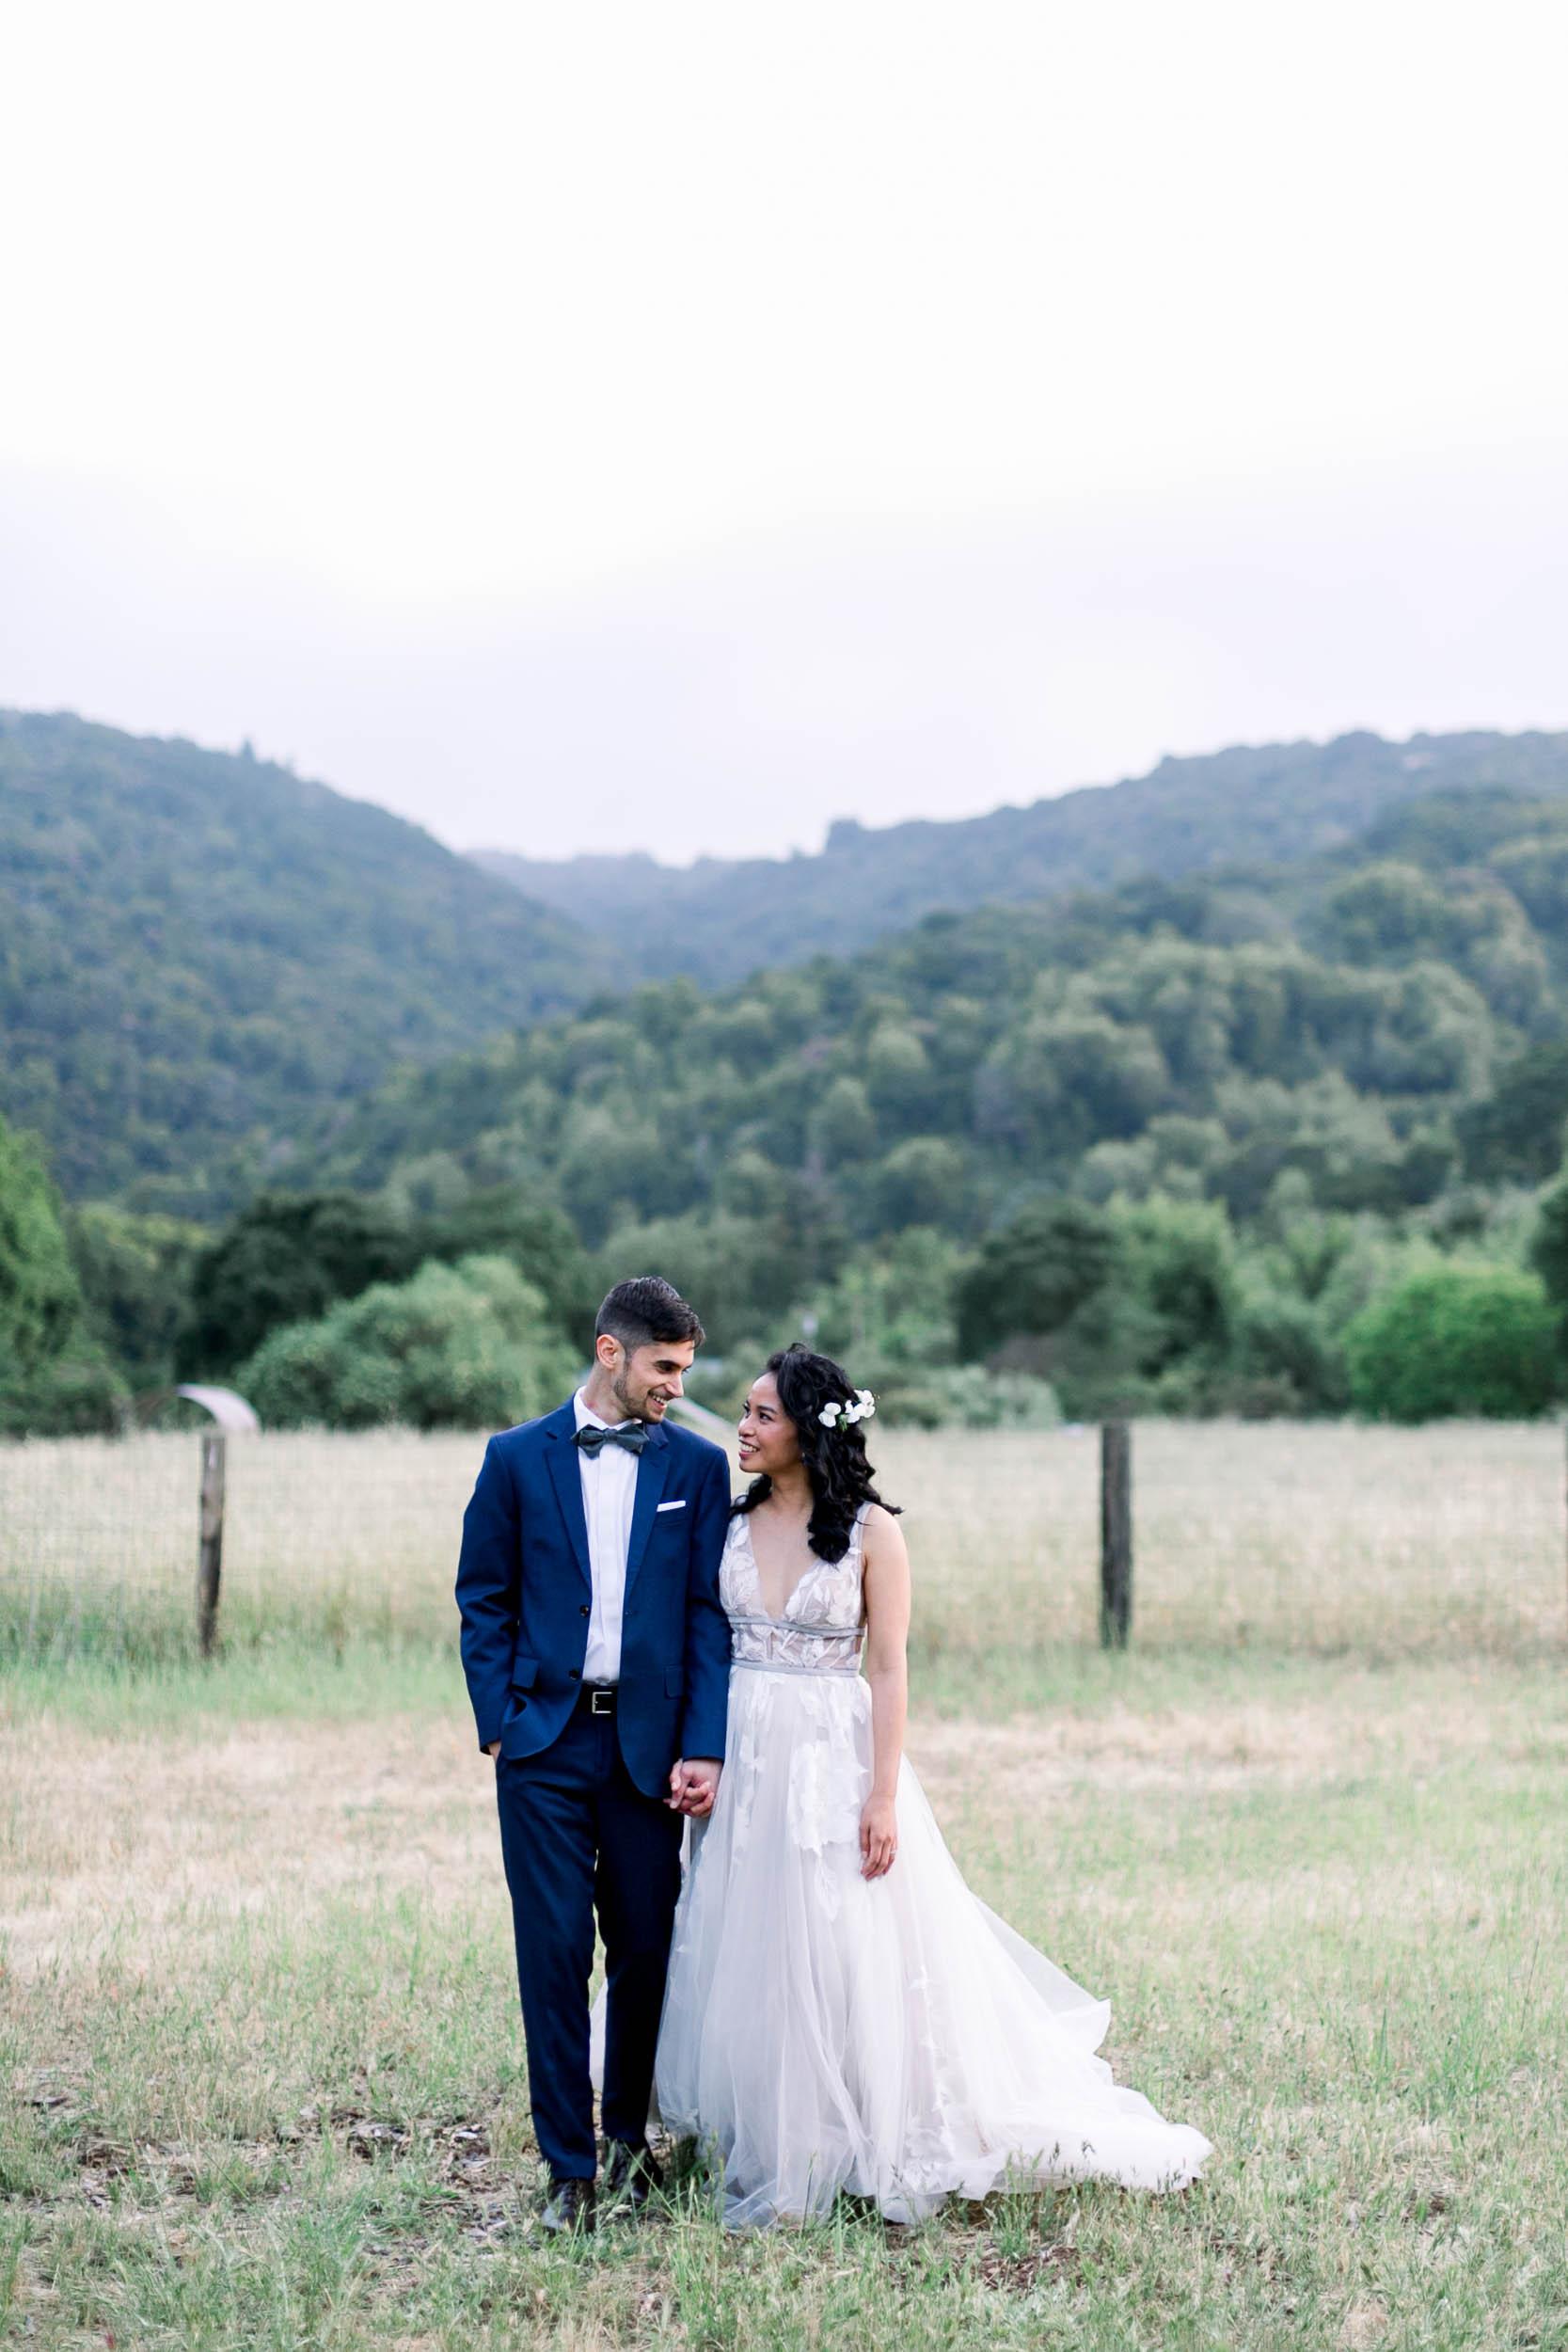 052519_B+S_Hidden Villa Wedding_Buena Lane Photography_052519_1083CY.jpg